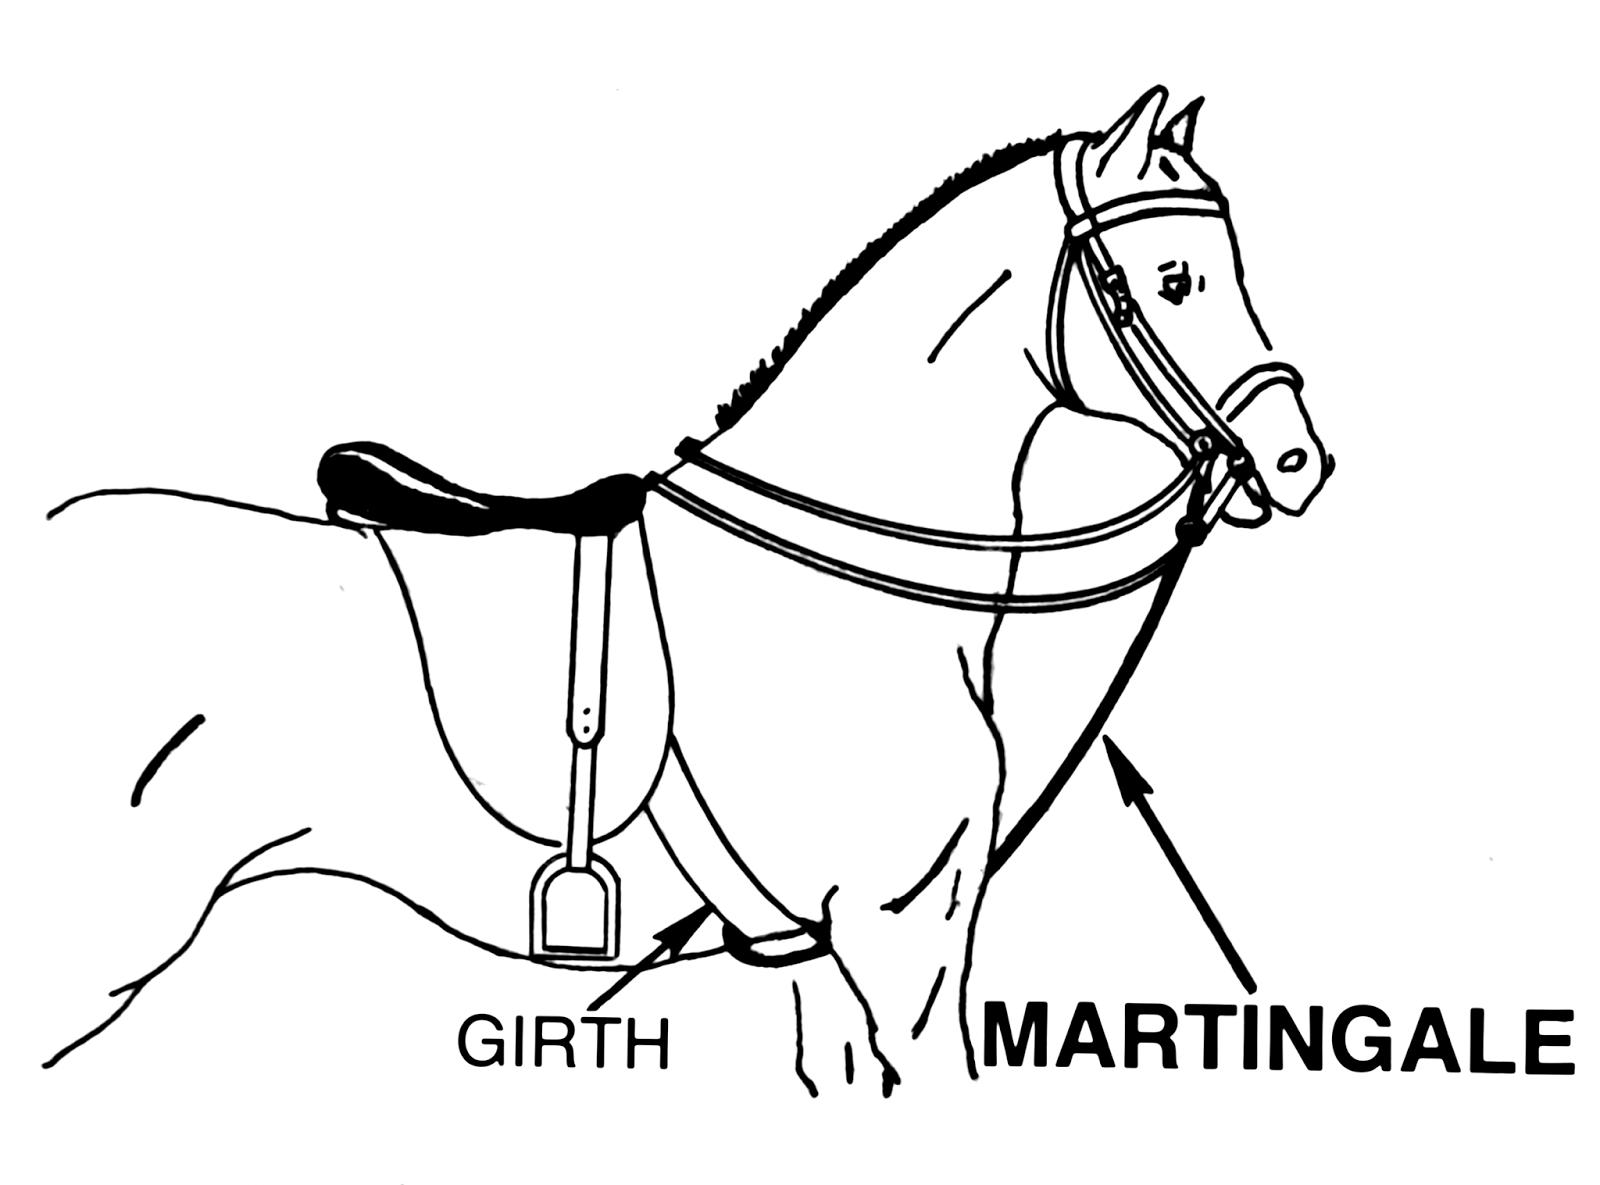 Martingale 0